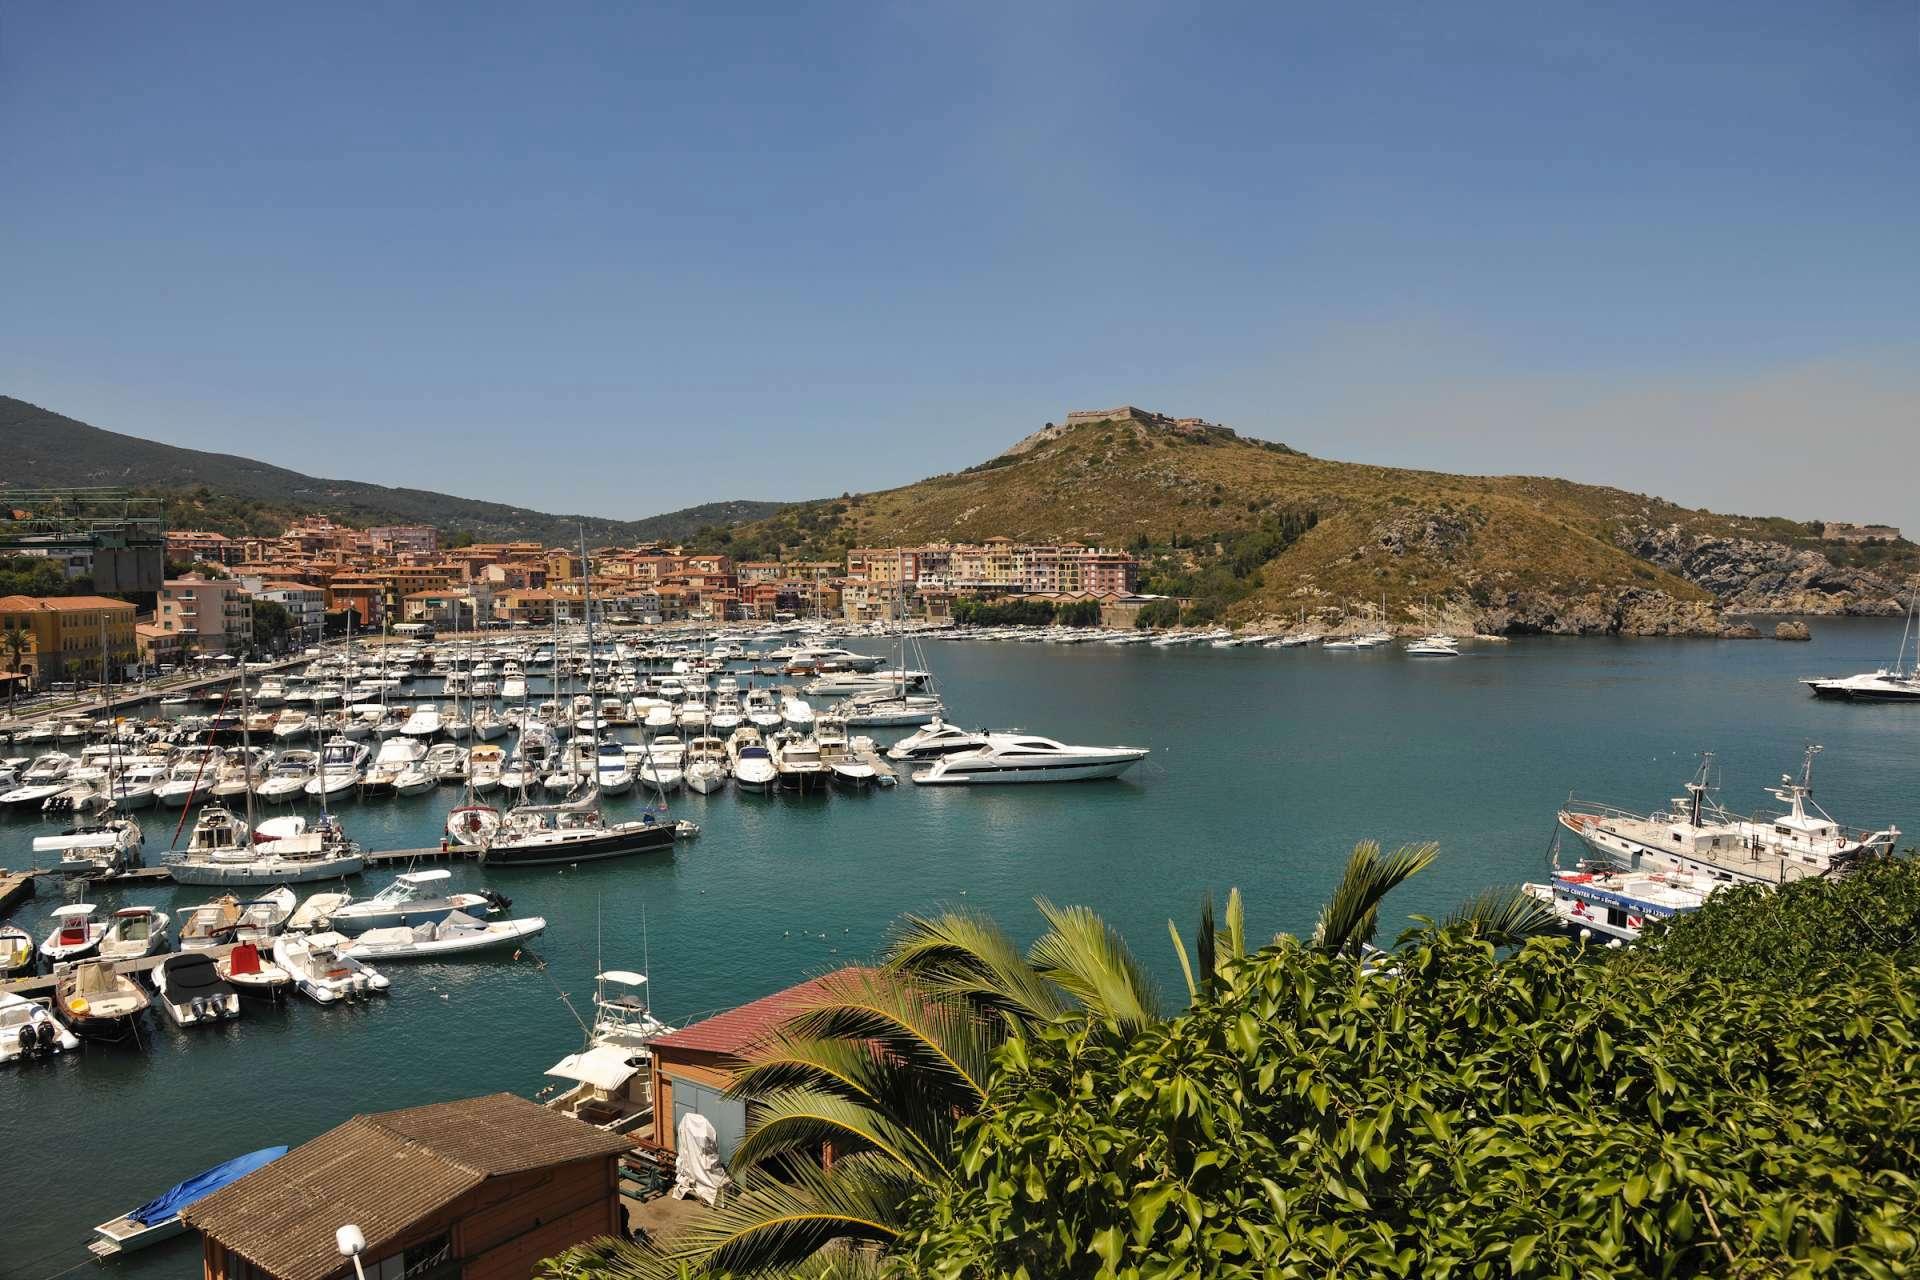 Tuscany Beach Villas: Choosing the Right Villa by the Sea